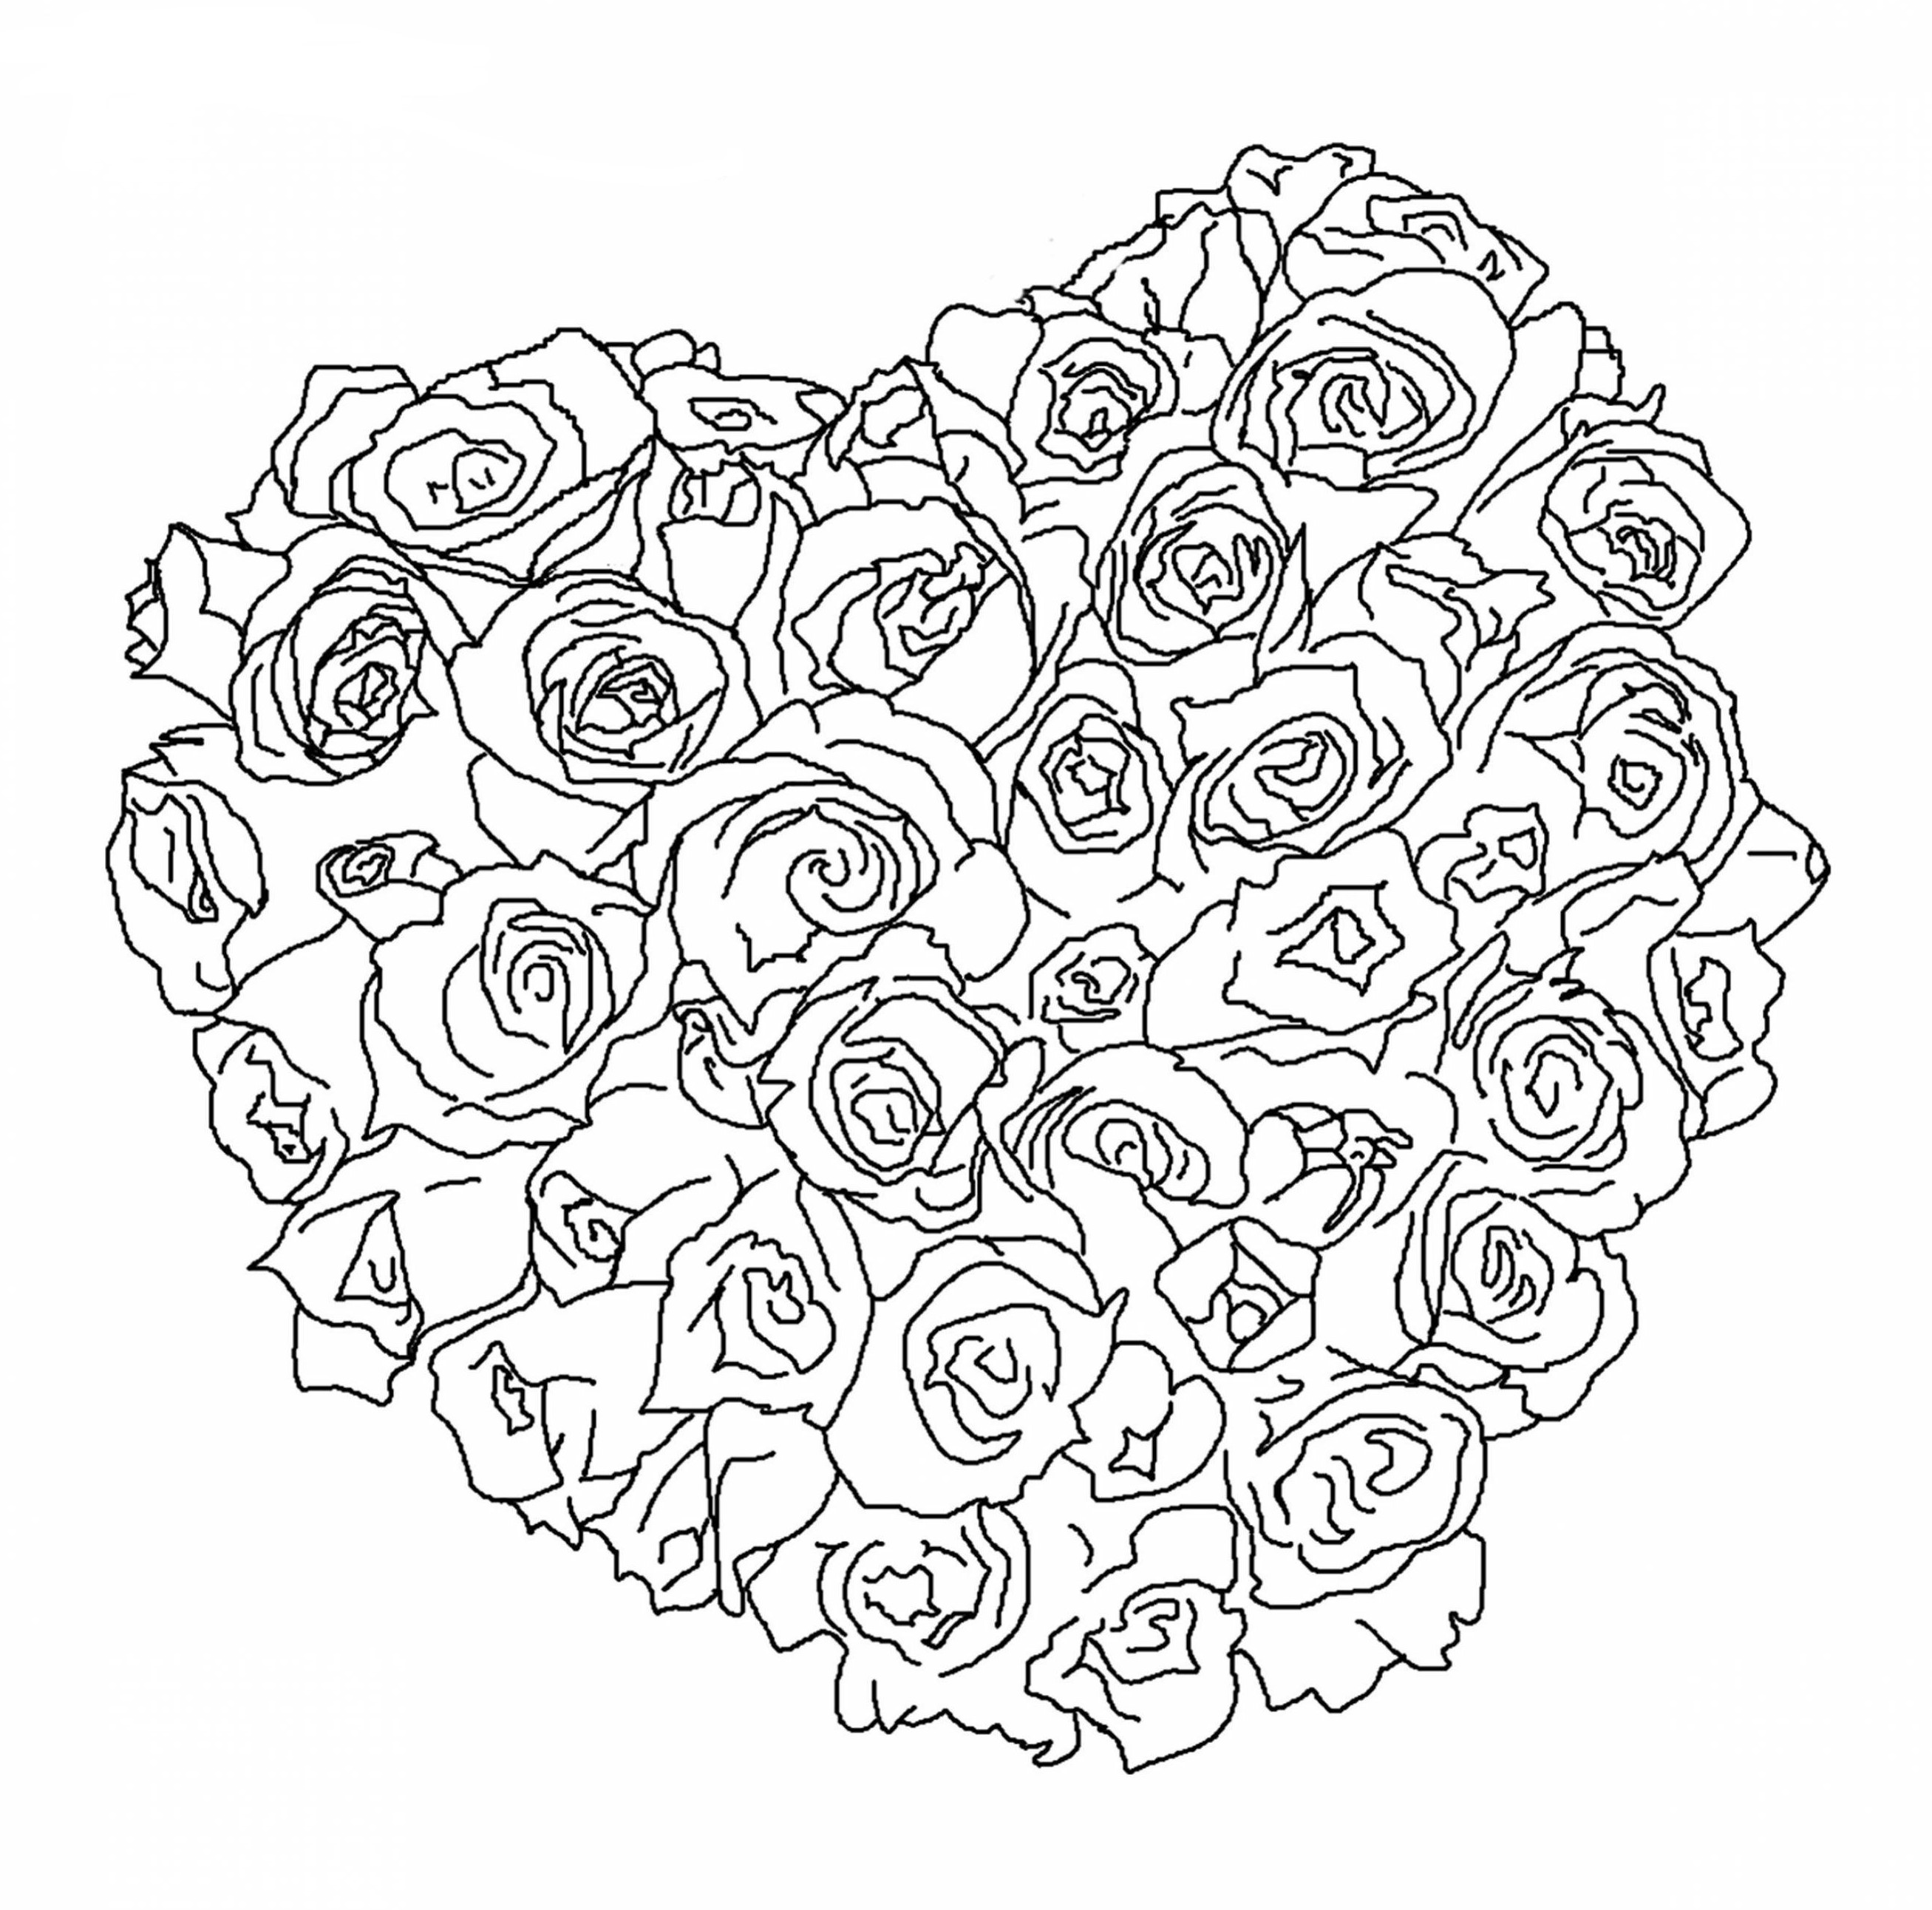 сердце из роз сердца раскраски антистресс